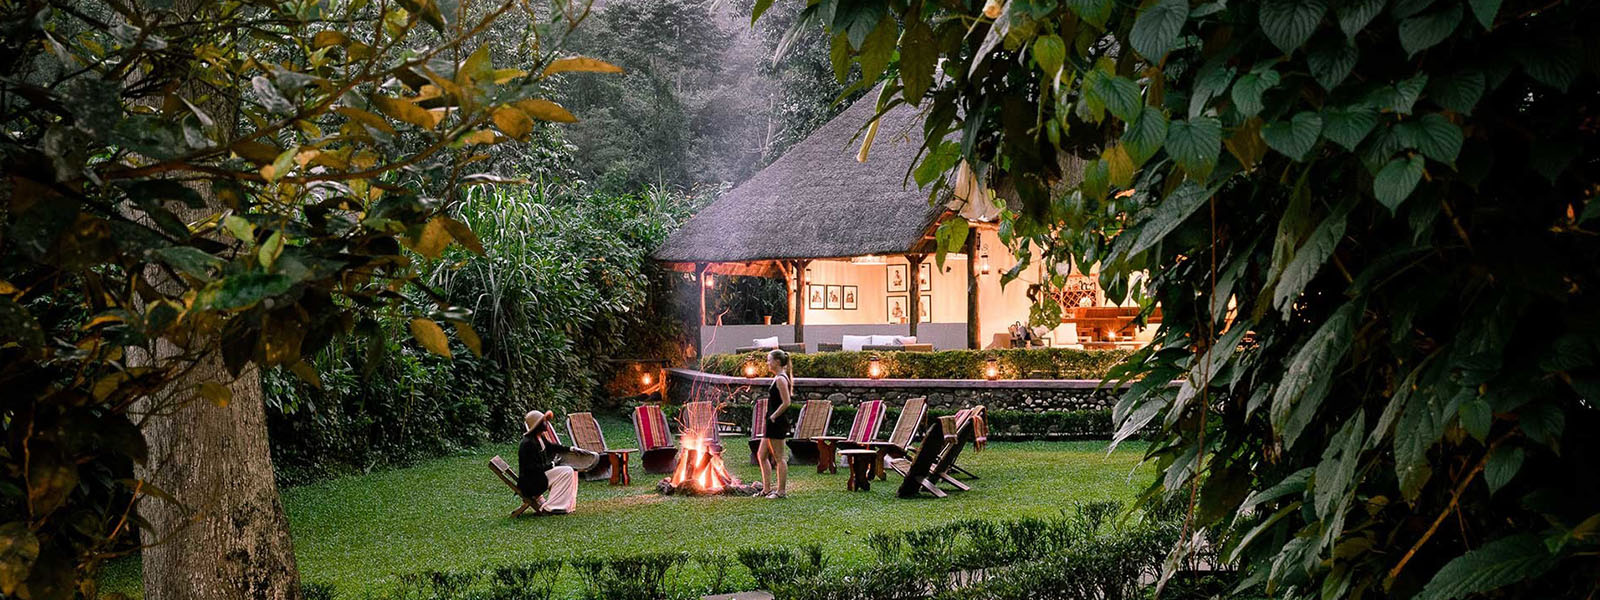 5 Most Popular National Parks in Uganda